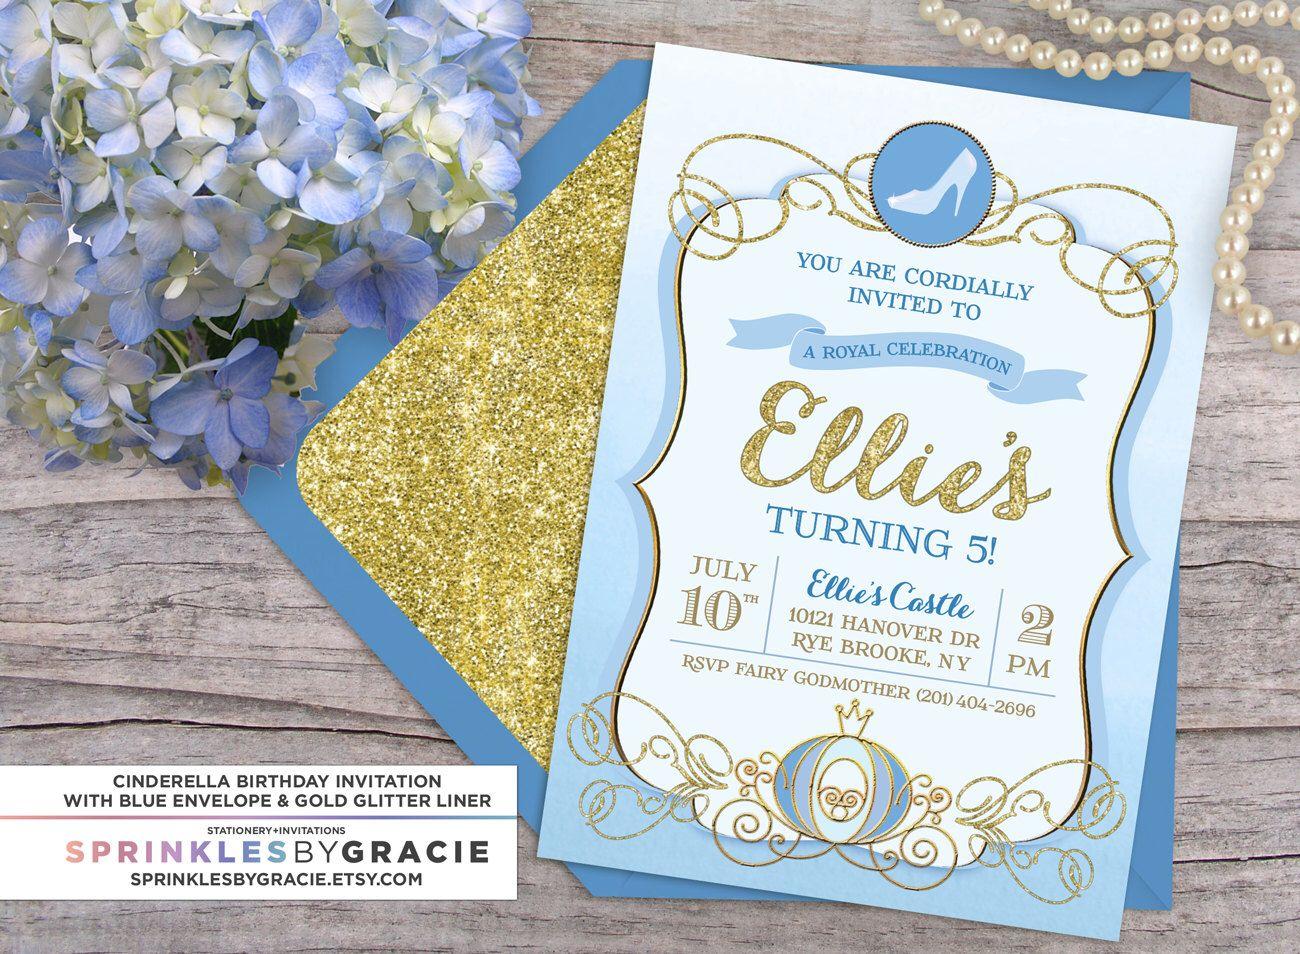 Cinderella Royal Ball Birthday Party Invitation with Free Shipping ...